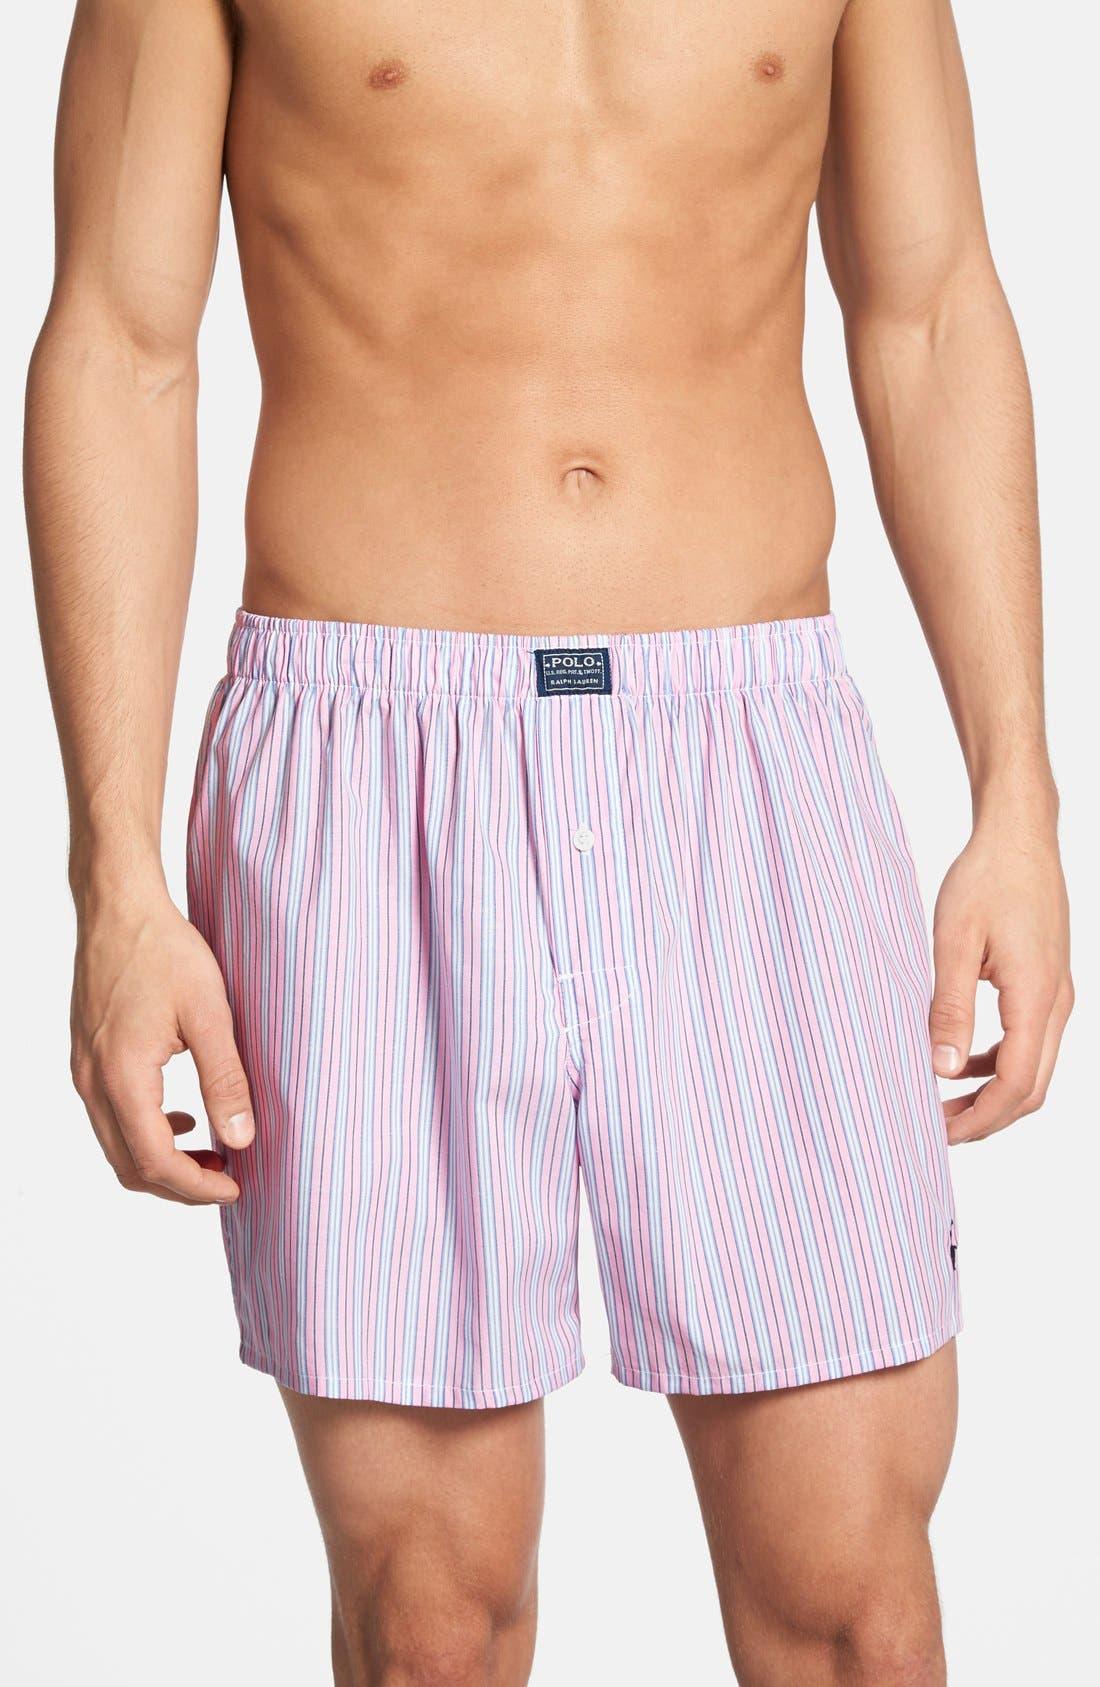 Alternate Image 1 Selected - Polo Ralph Lauren Woven Boxer Shorts